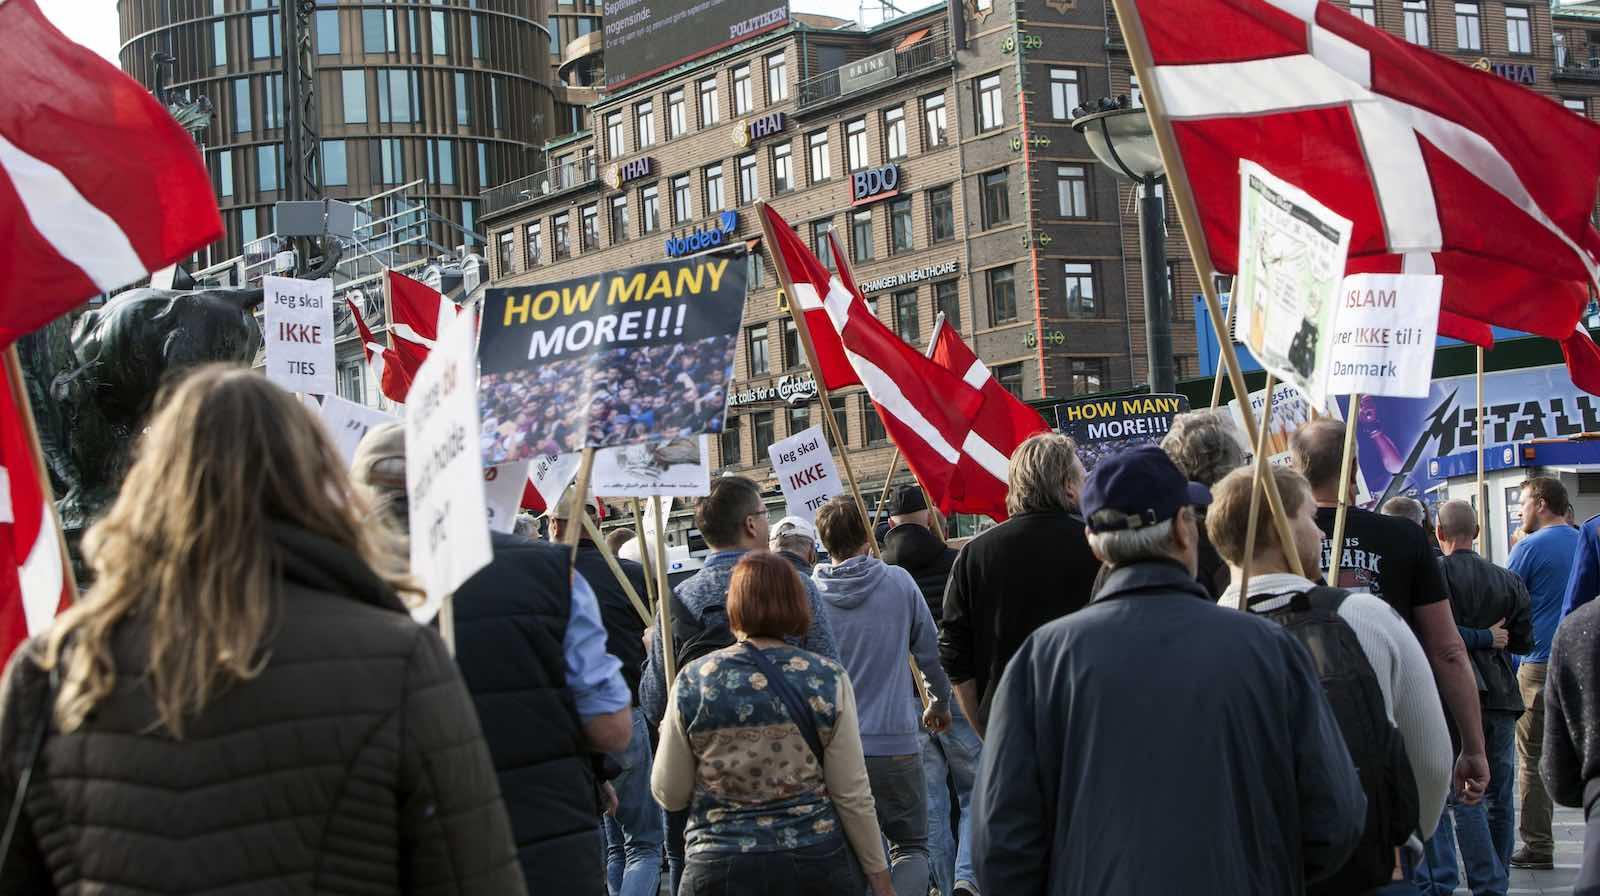 Protestors organised by For Freedom (Danish, read: For Frihed) demonstrate against Muslim through Copenhagen, Denmark, in 2016 (Photo: Ole Jensen via Getty)